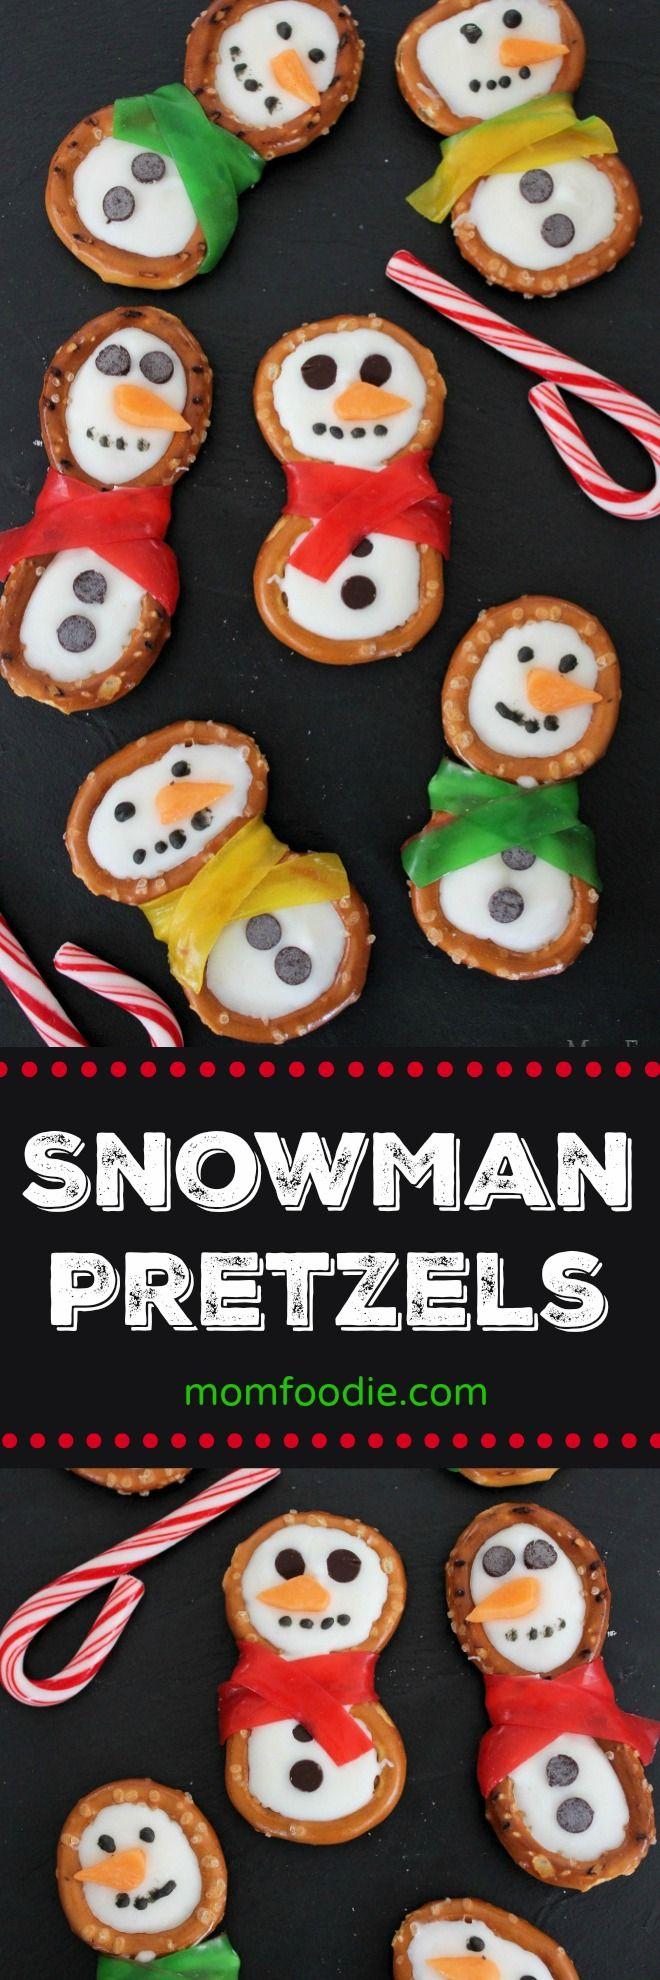 Snowman Pretzel Treats - These little snowman pretzels are cute #Christmas #christmastreats #snowman #DIYchristmasgifts #holidays #pretzels